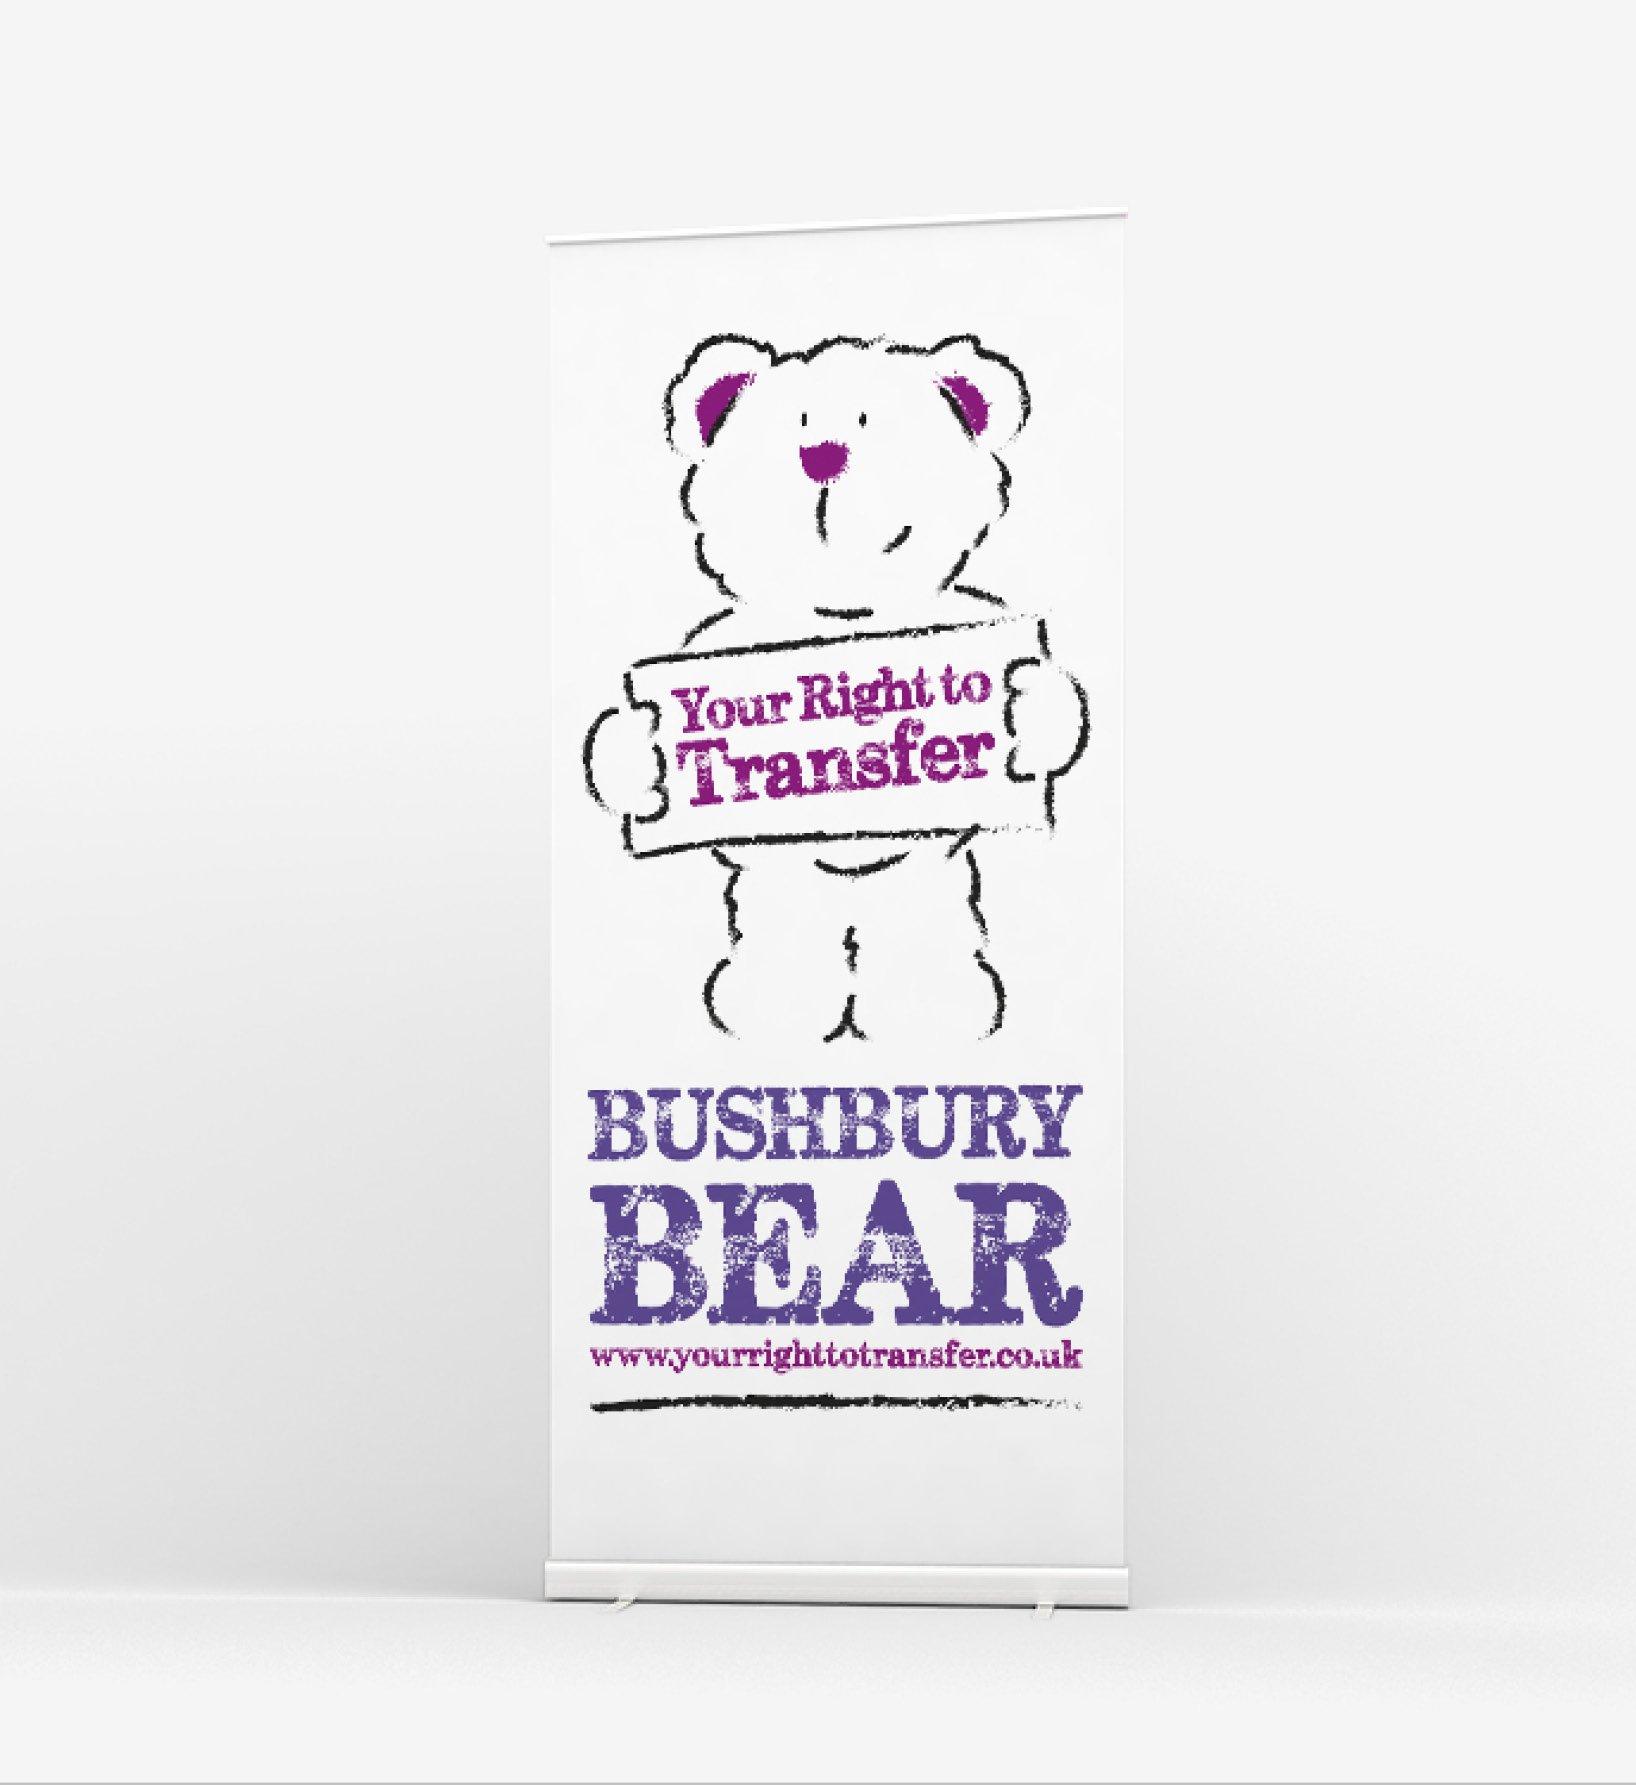 Bushbury roll ups